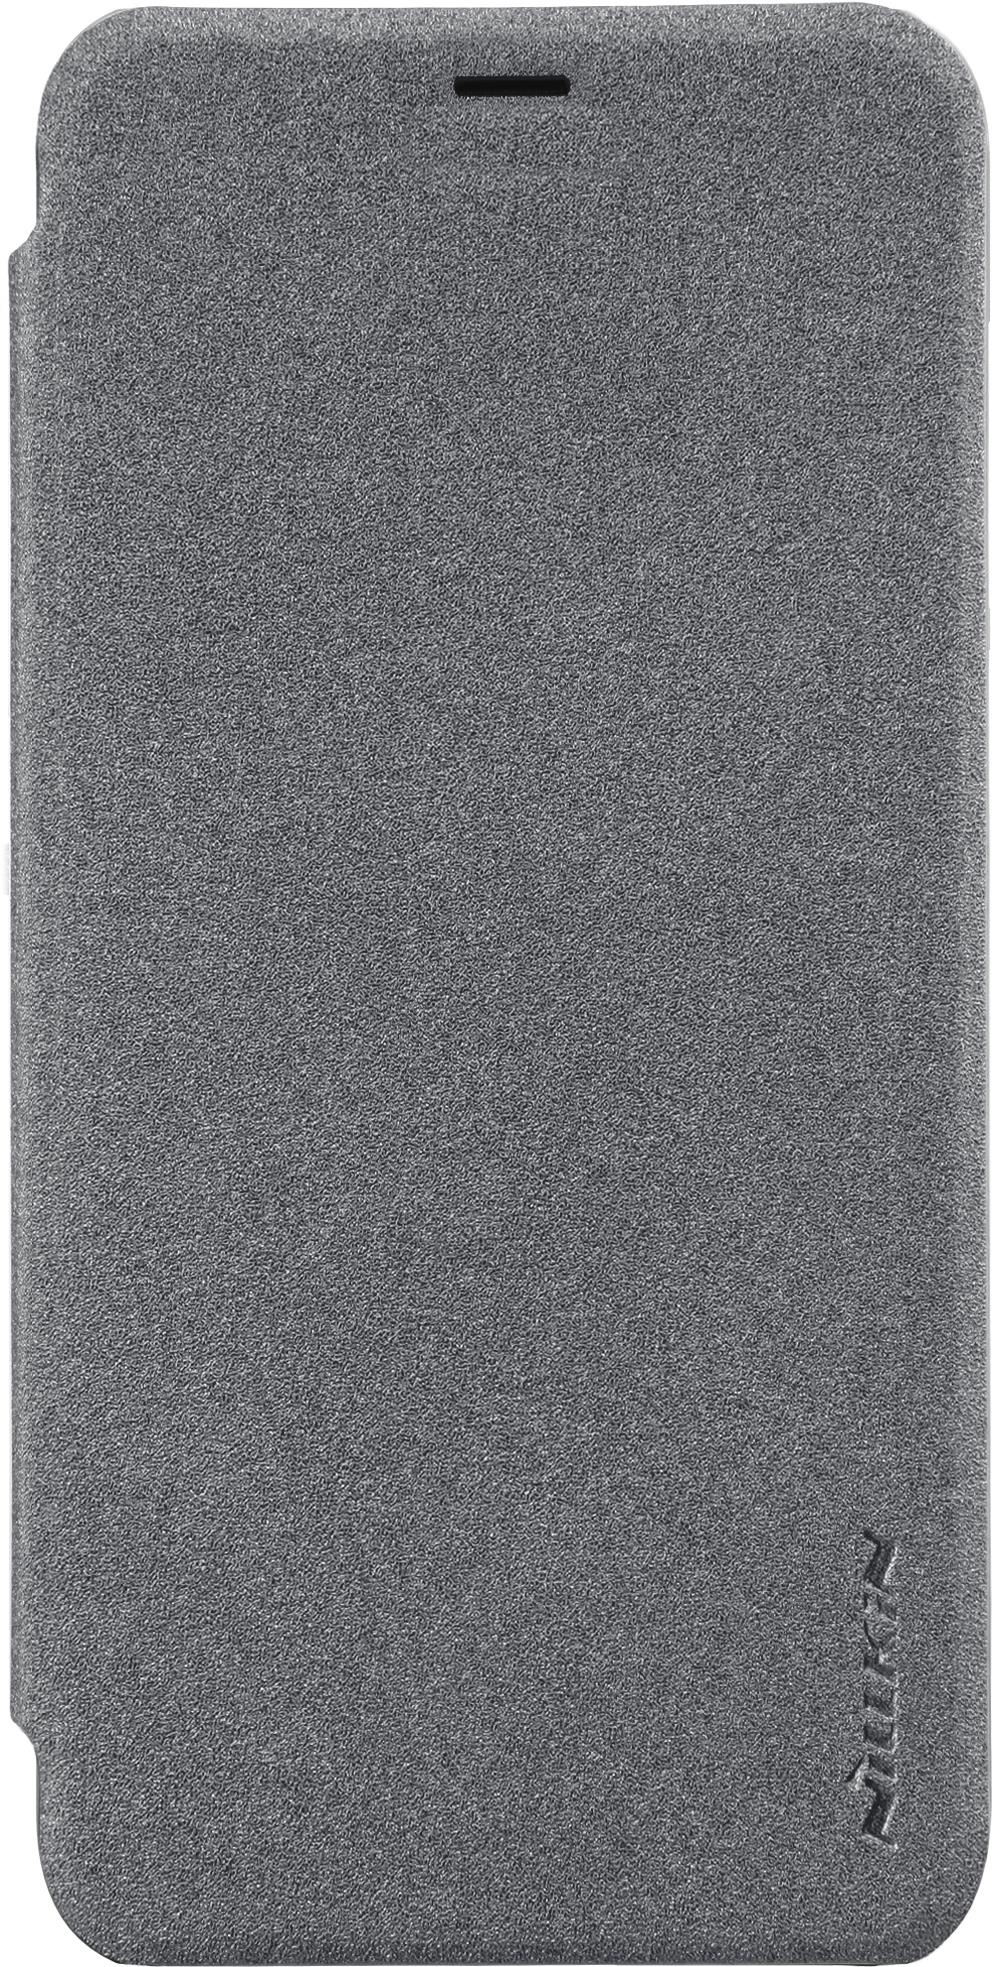 Чехол-книжка Nillkin Sparkle для P Smart, 6902048152373, черный цена